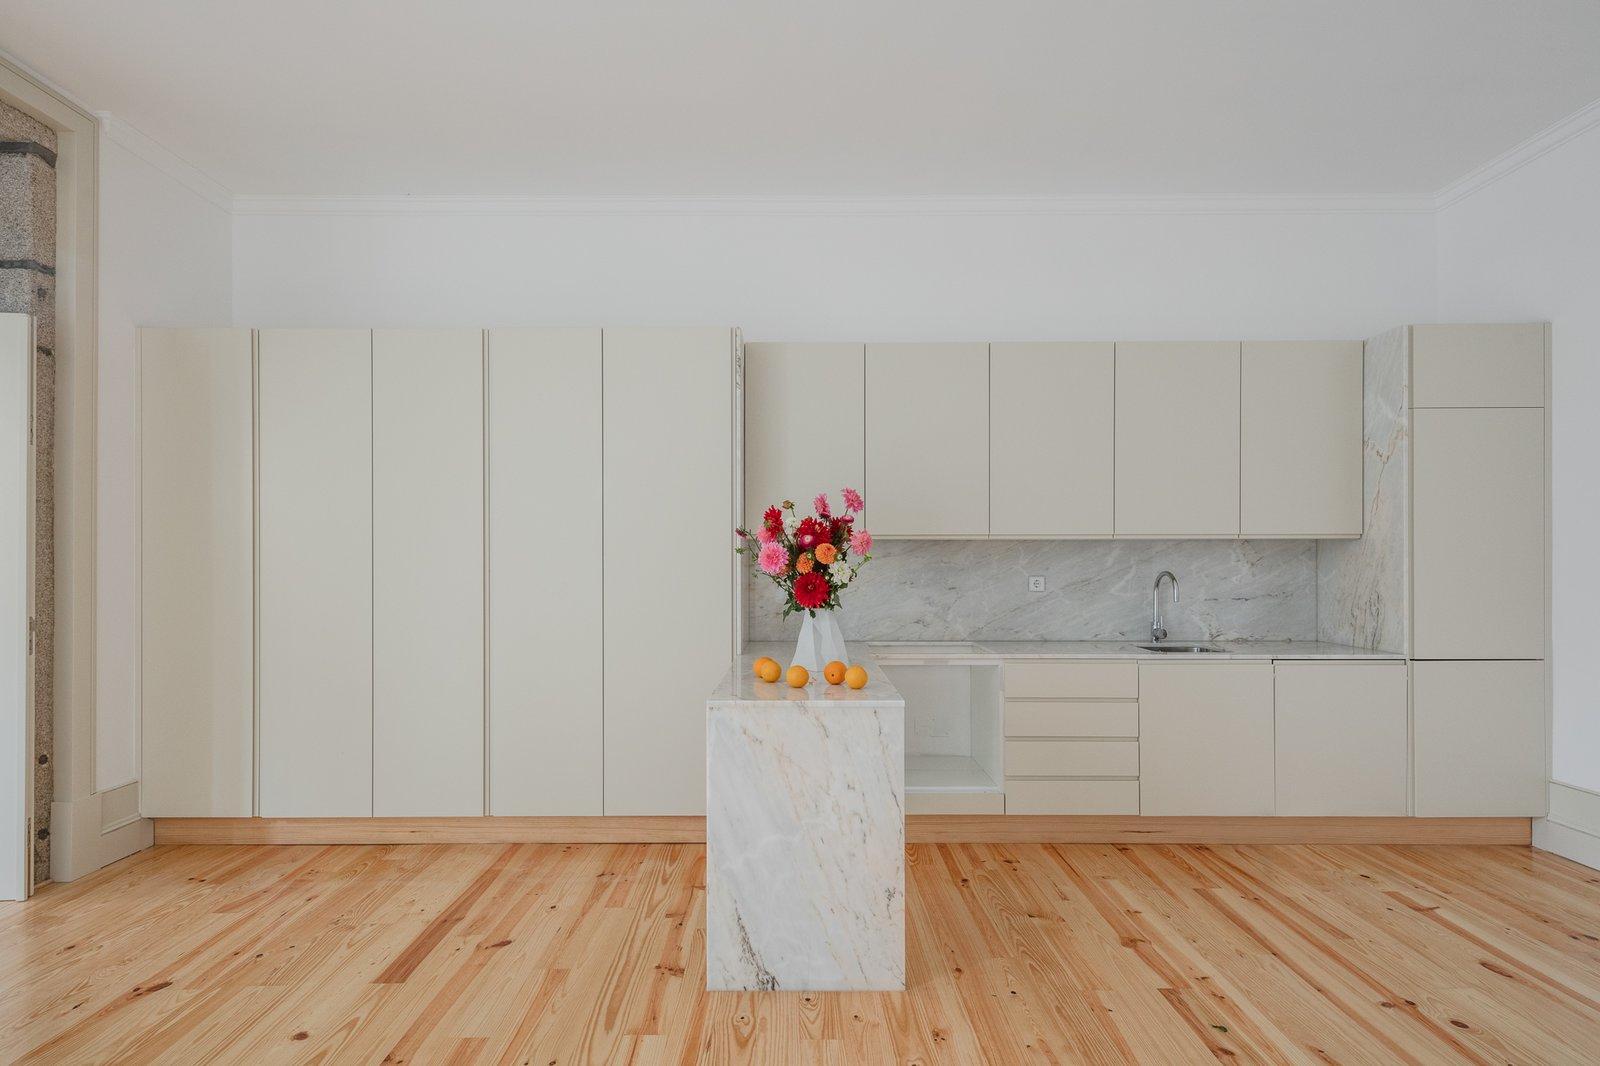 Tagged: Kitchen, Marble Counter, White Cabinet, and Light Hardwood Floor.  Rua da Boavista by Leibal